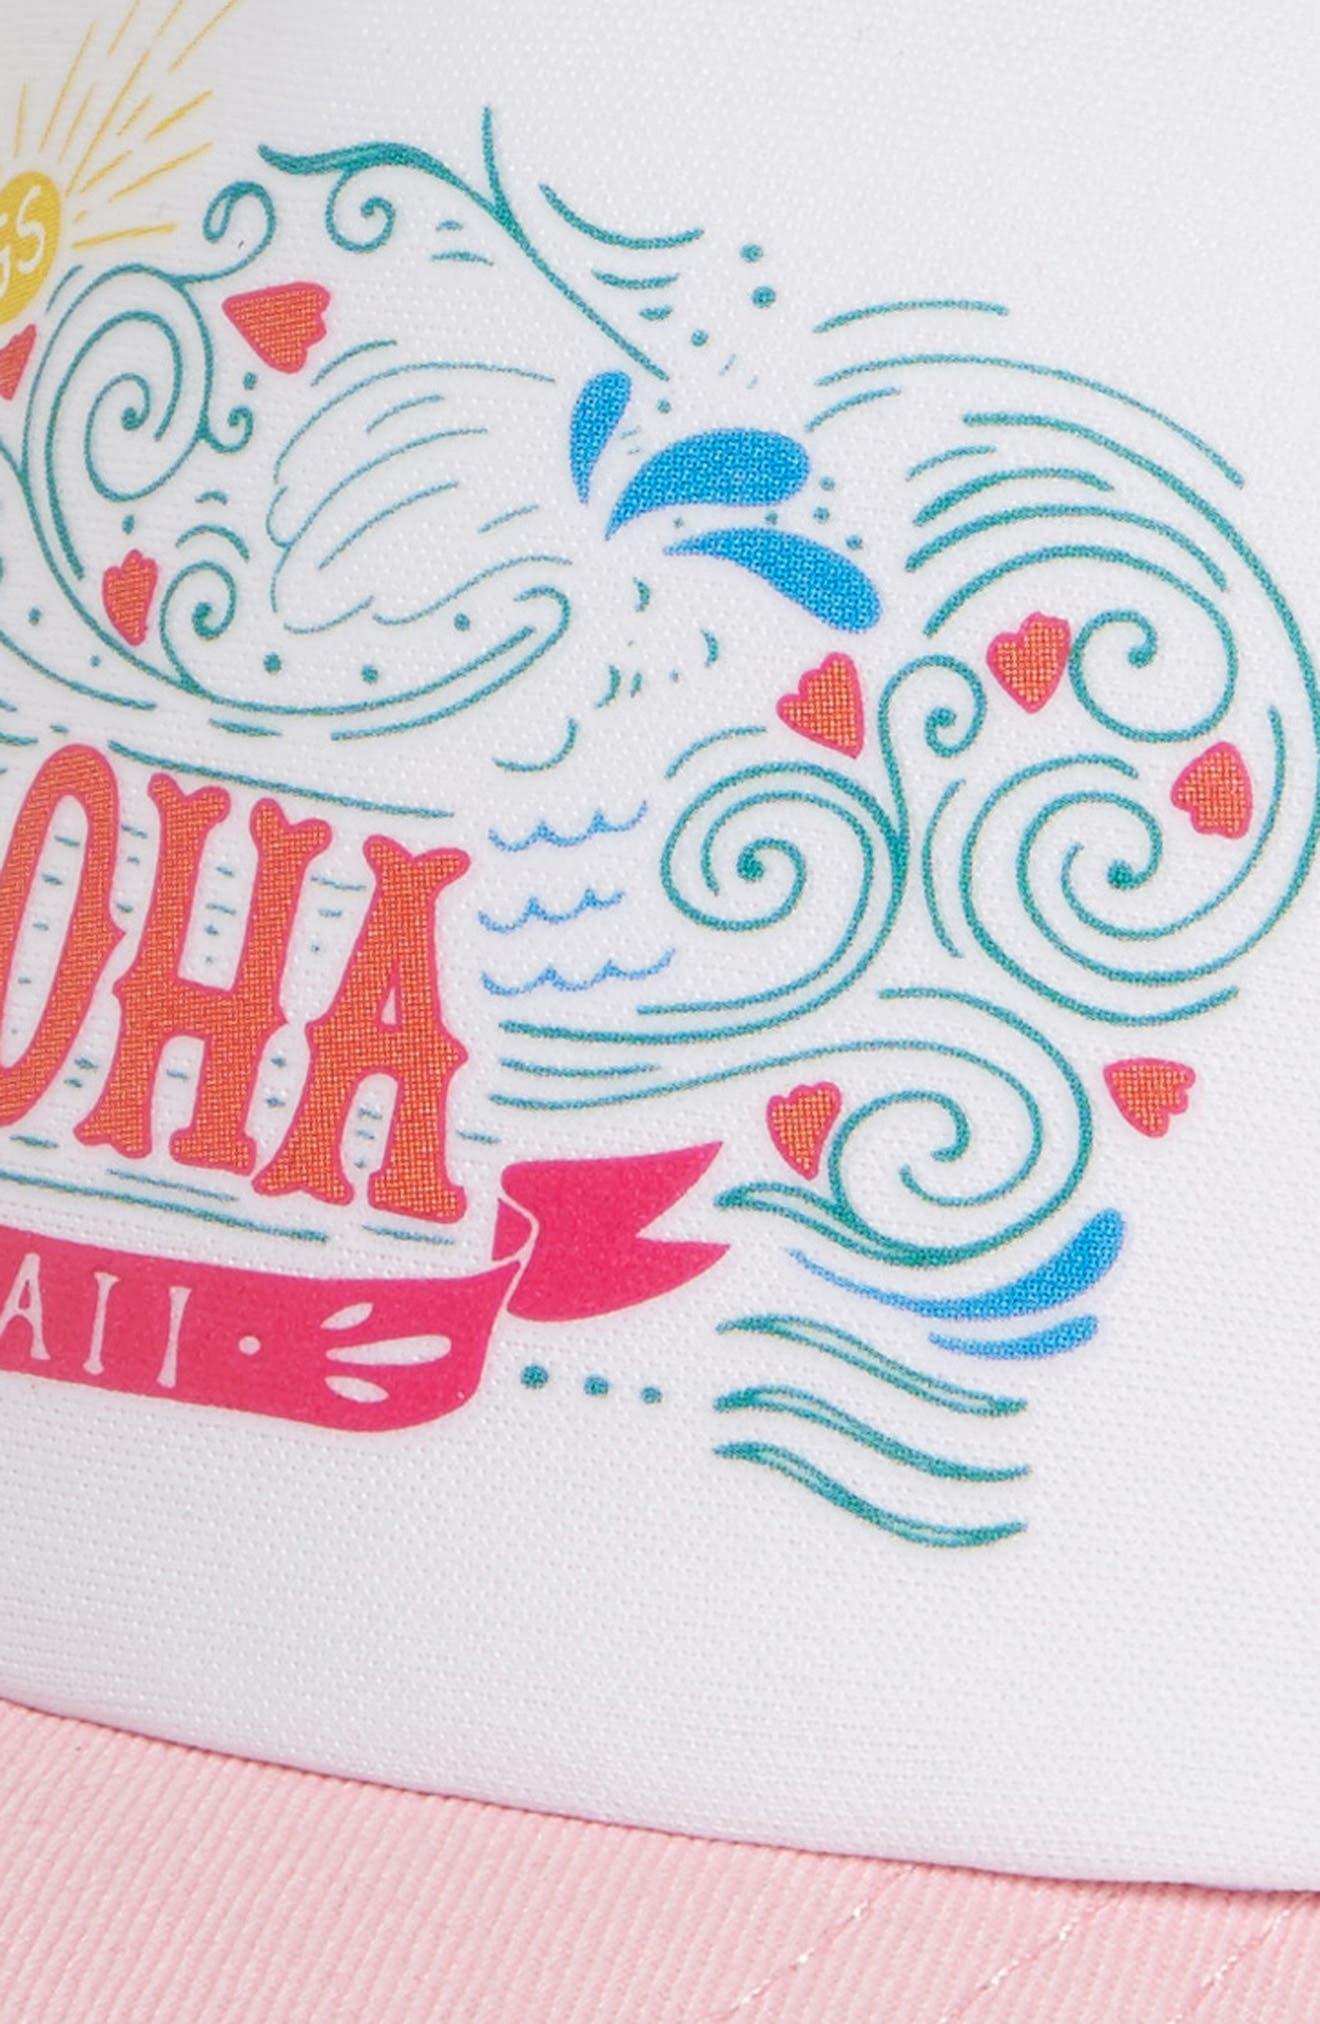 Aloha Tides Trucker Hat,                             Alternate thumbnail 3, color,                             PINK/ WHITE